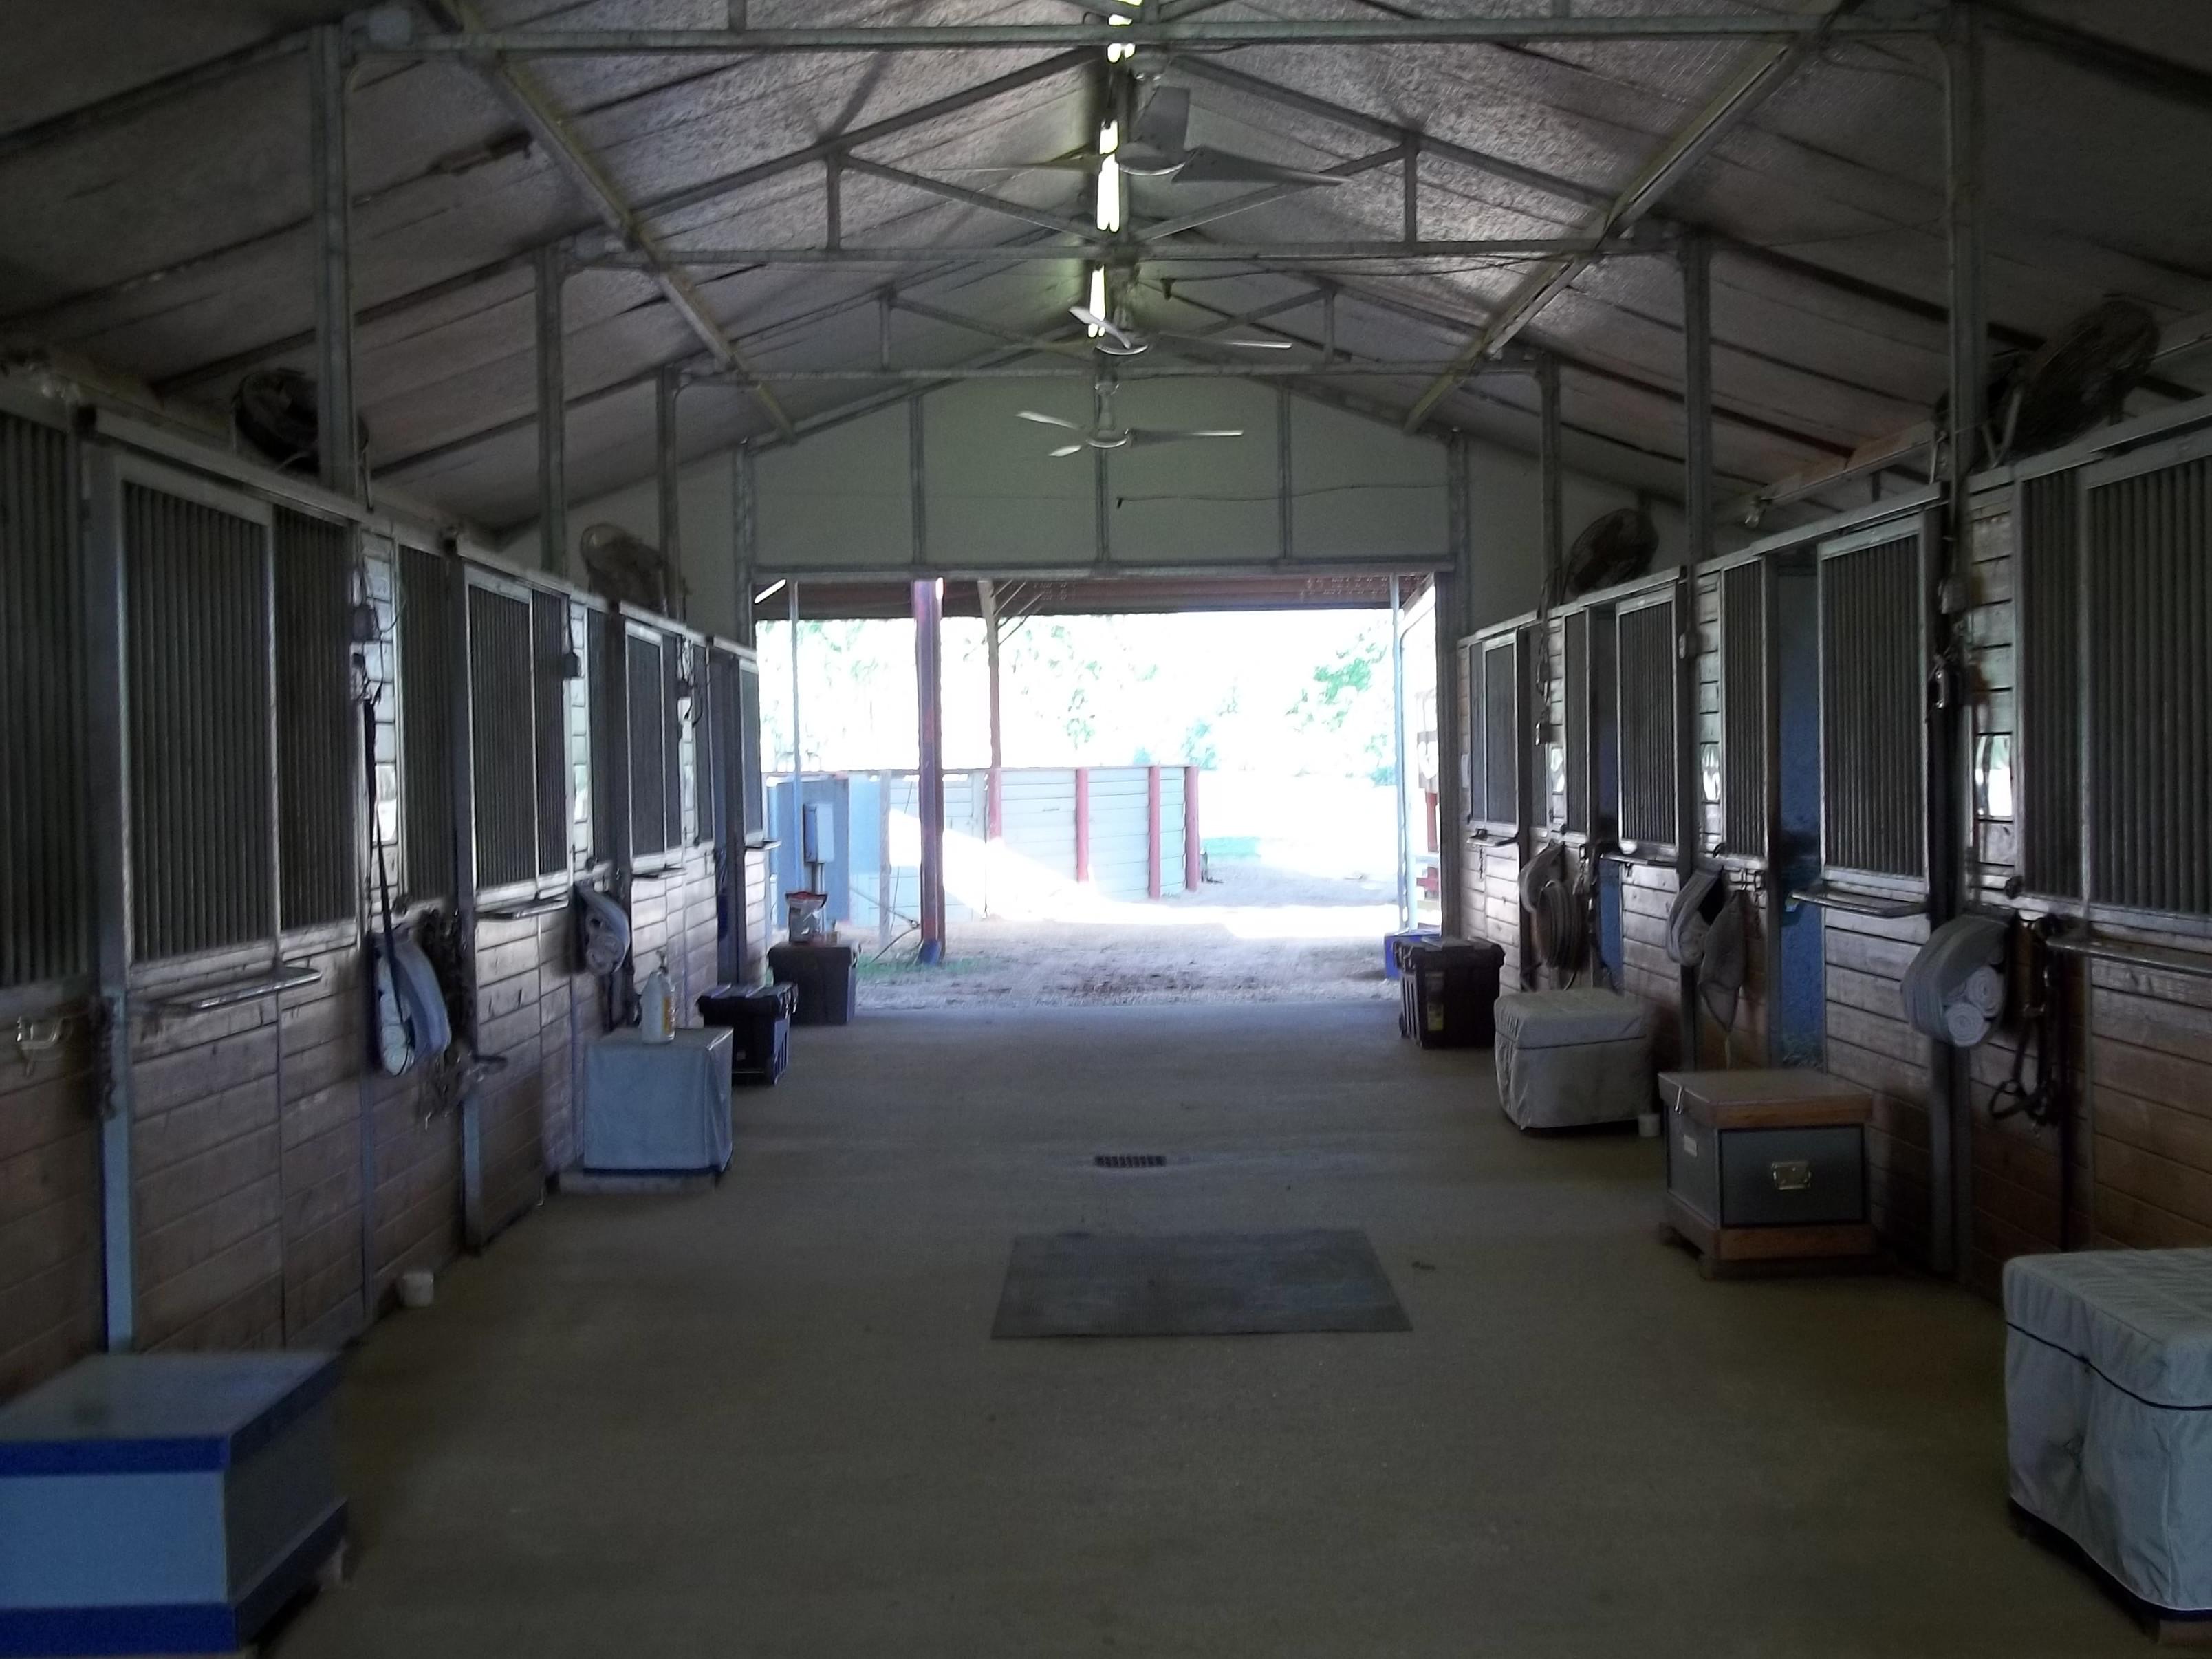 lanham hardwood flooring louisville ky of showbarn03 little bay farm within main barn